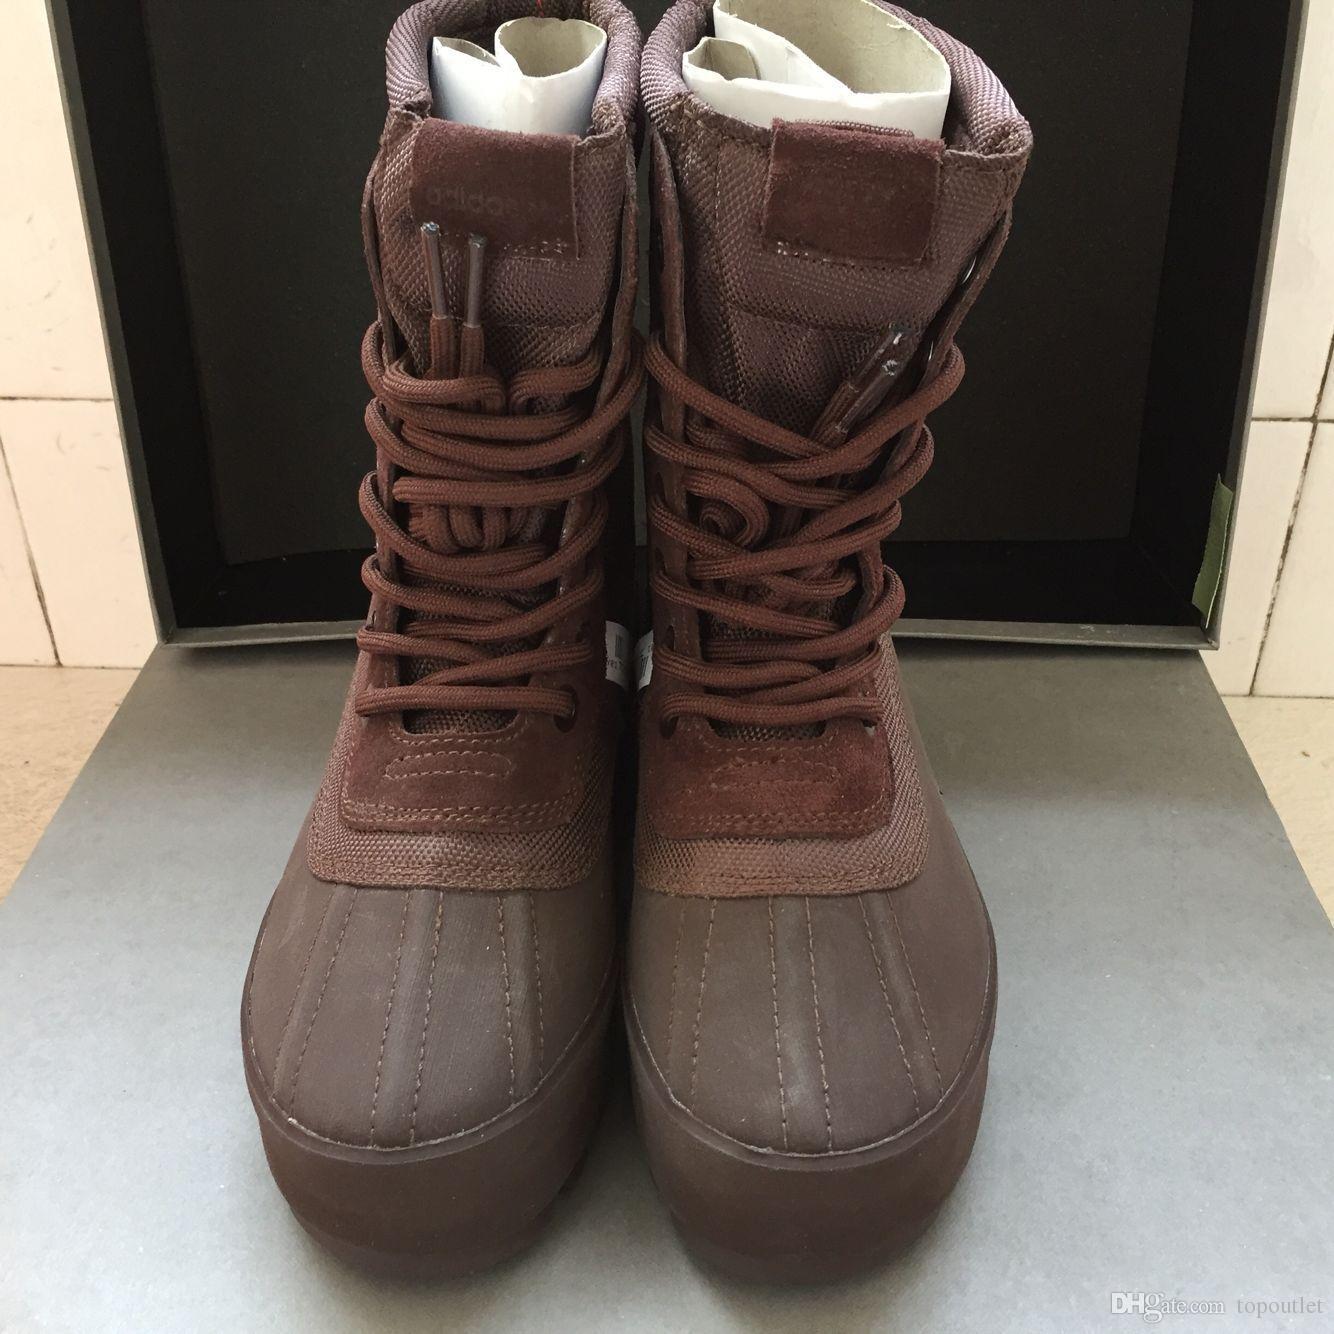 8e45011bb05a Großhandel 750 Pirate Black Women Stiefel Männer Kanye West Schuhe Classic  Sports Lauf Casual Mode Sportlich Sneaker Eur  36 46 Mit Box Von Topoutlet,  ...